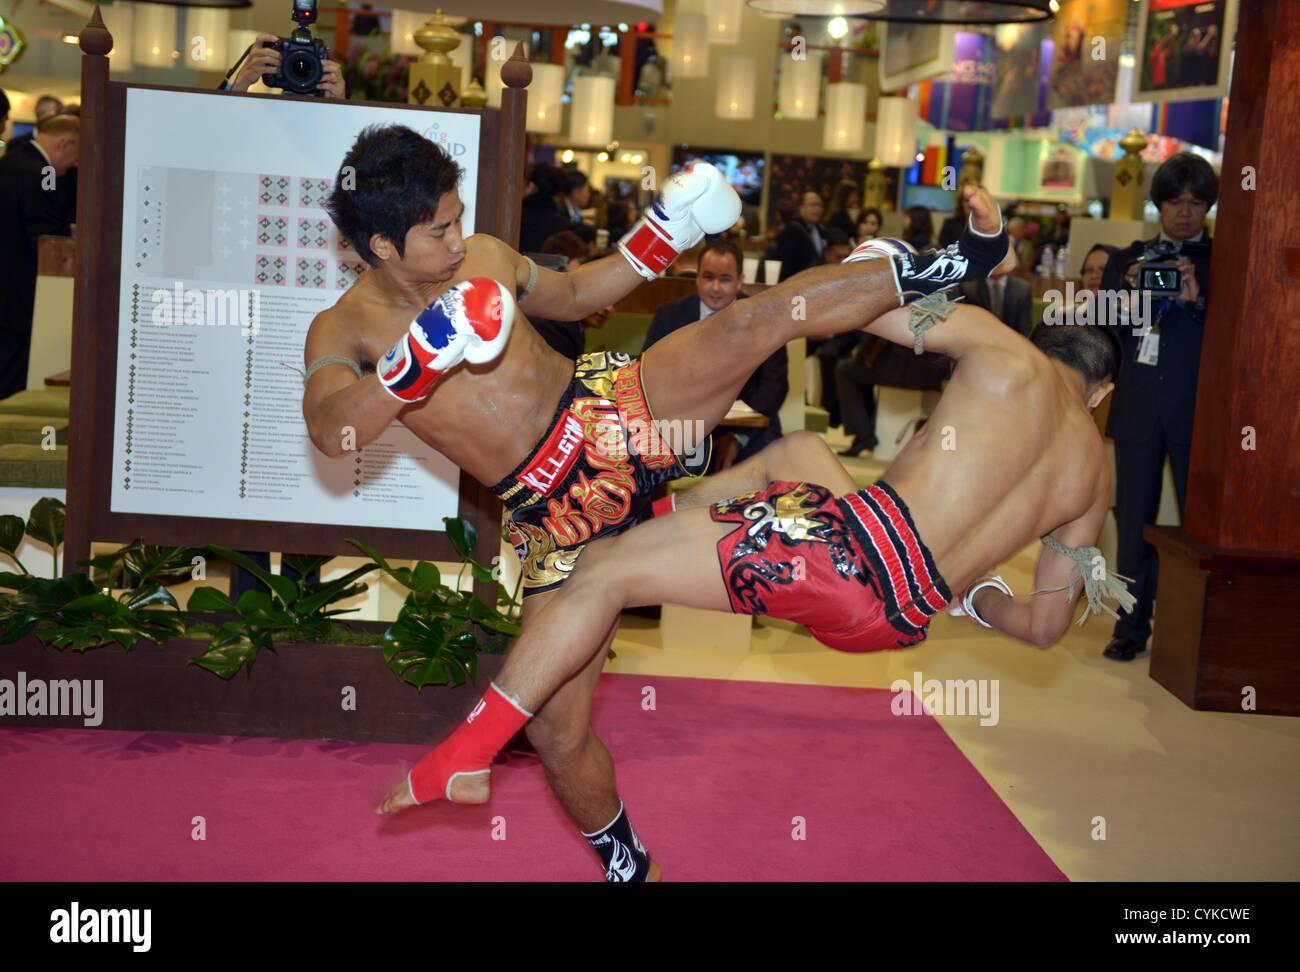 El World Travel Market de Londres, Reino Unido boxeo tailandés. Imagen De Stock